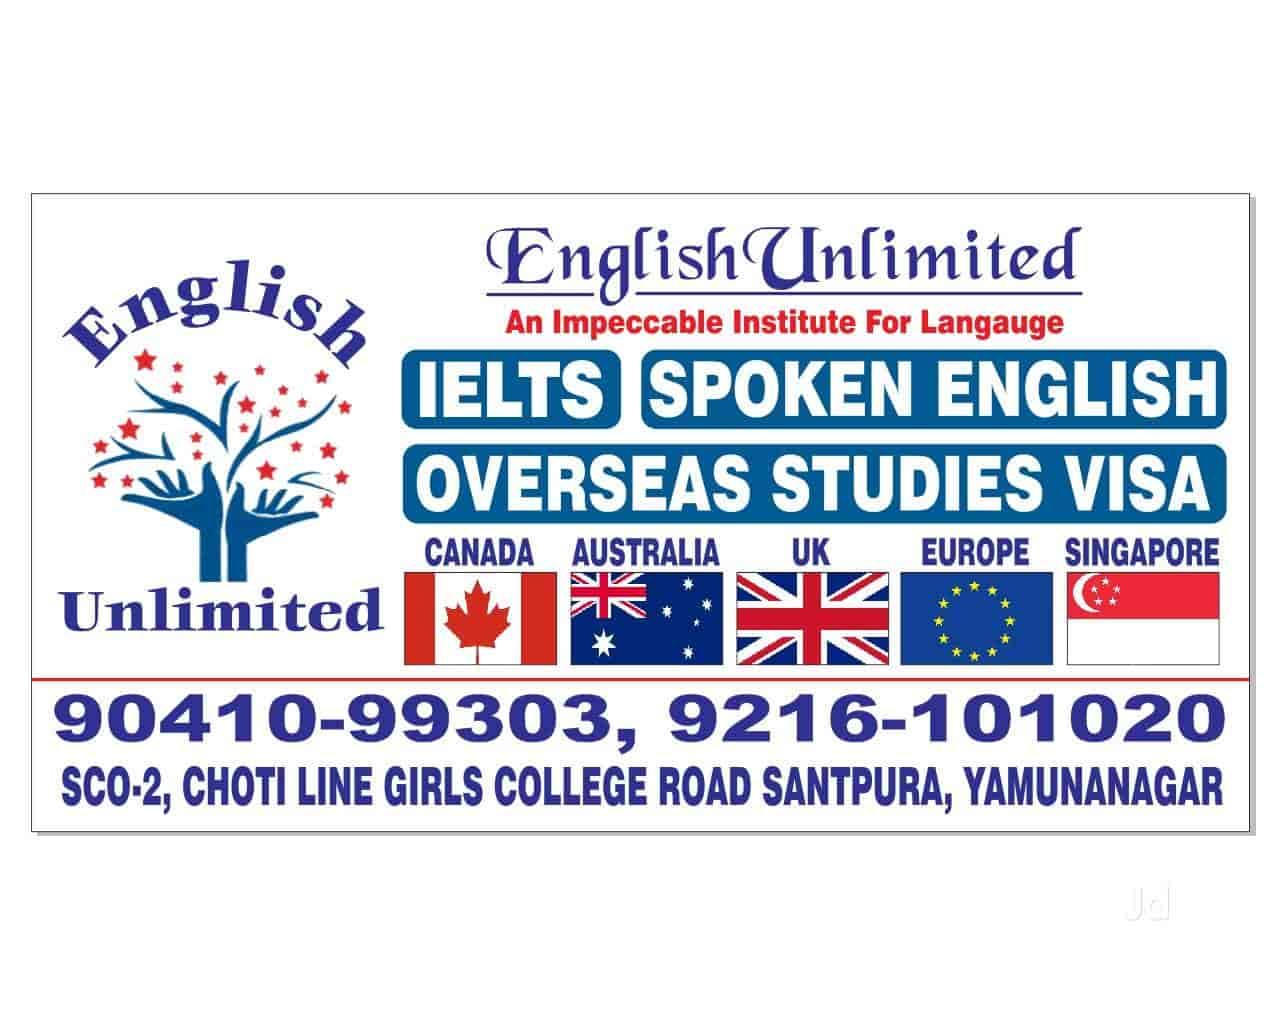 English Unlimited, Yamunanagar HO - Education Consultants in